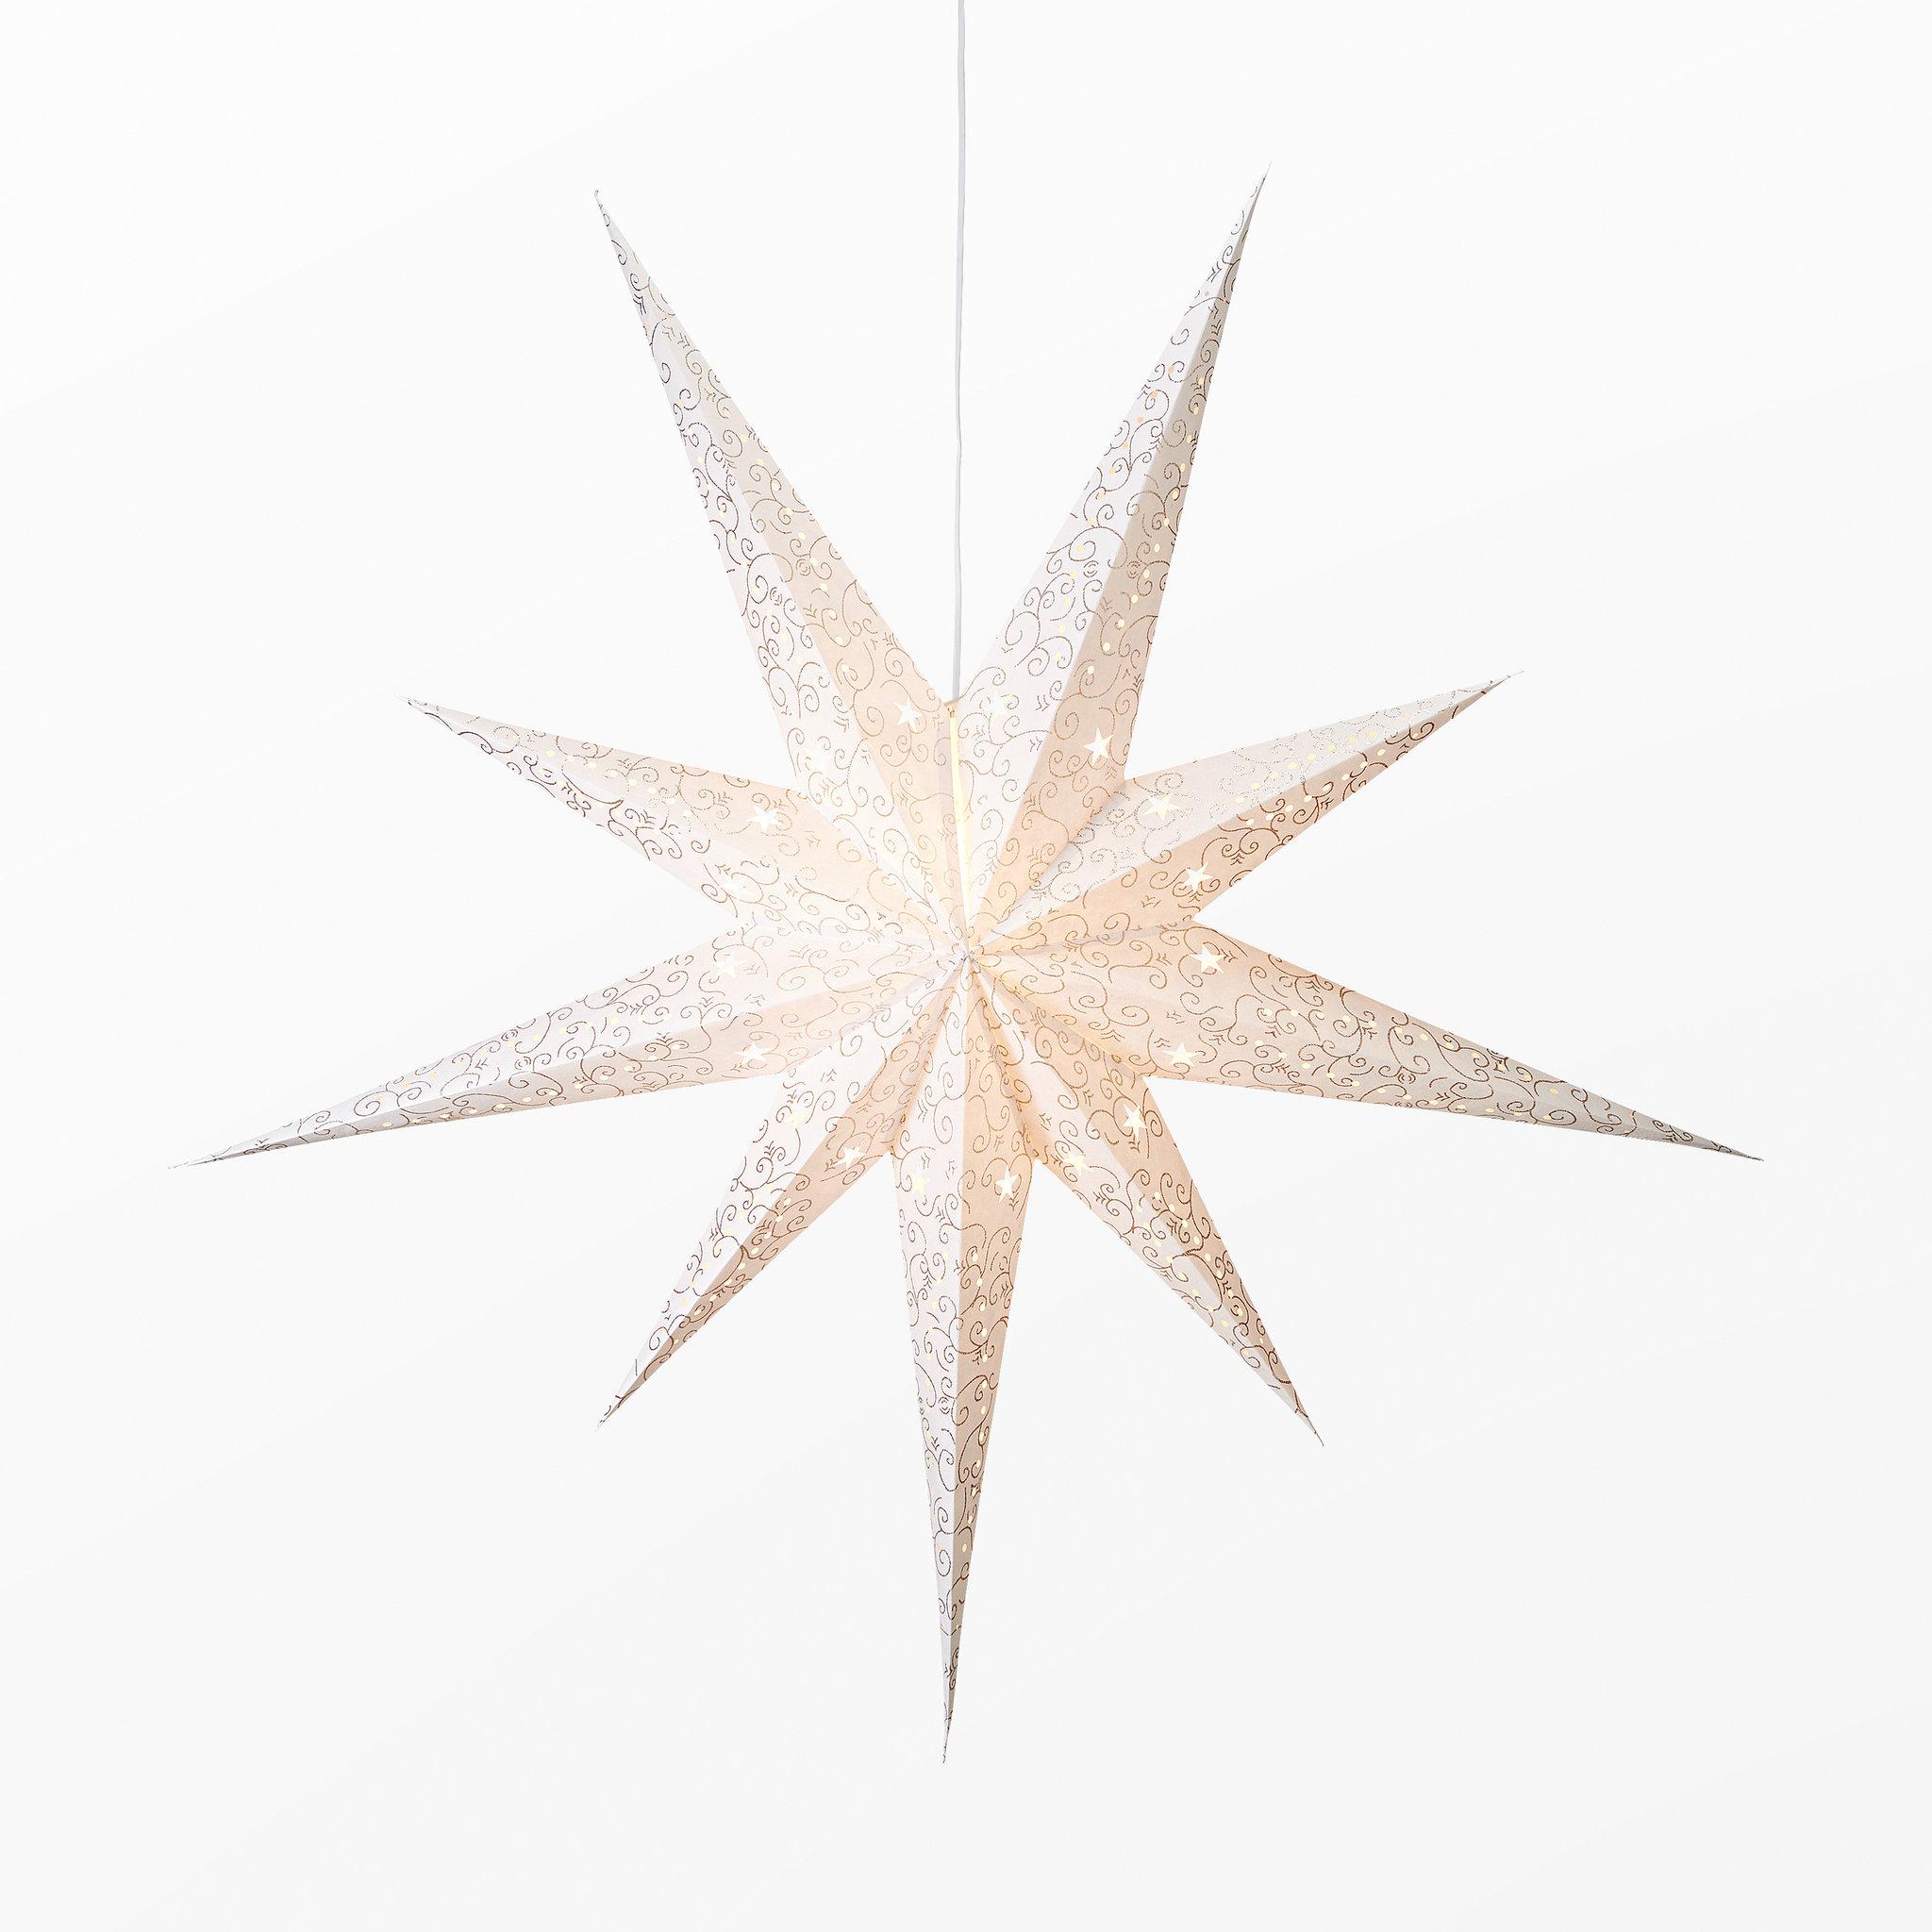 Adventsstjärna, Ø60 cm